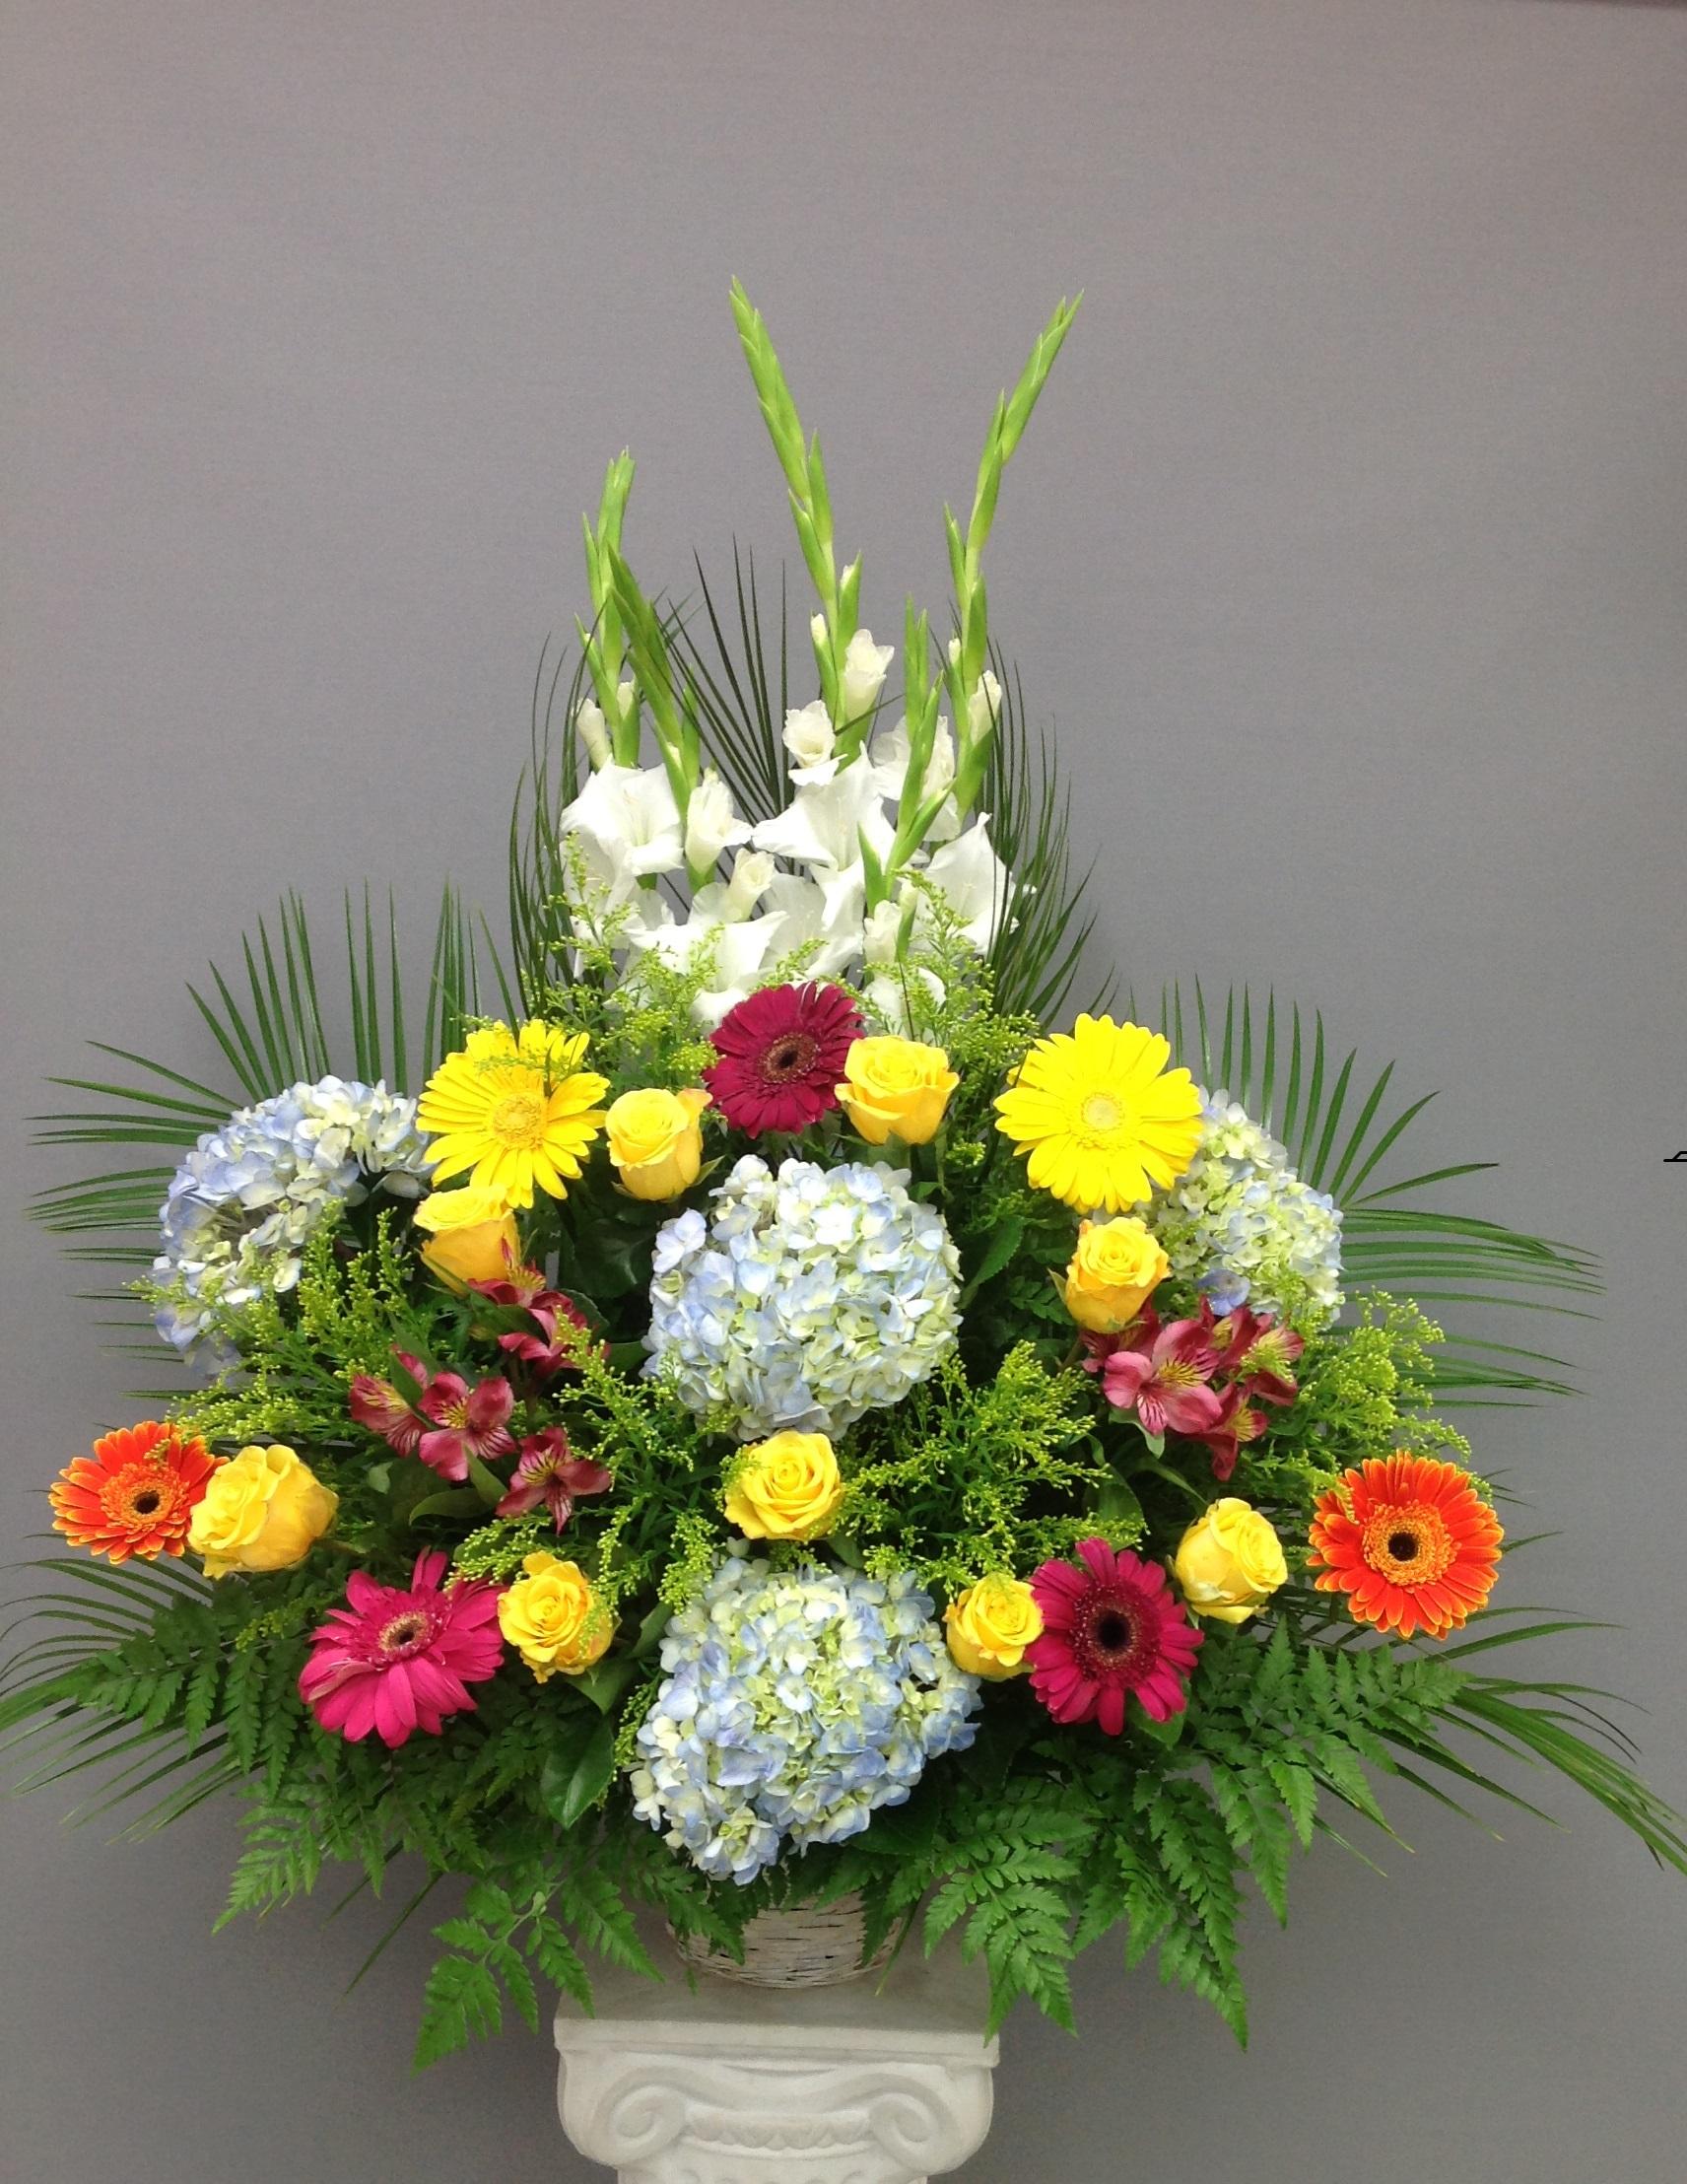 Funeral & Sympathy Flowers Glendale CA